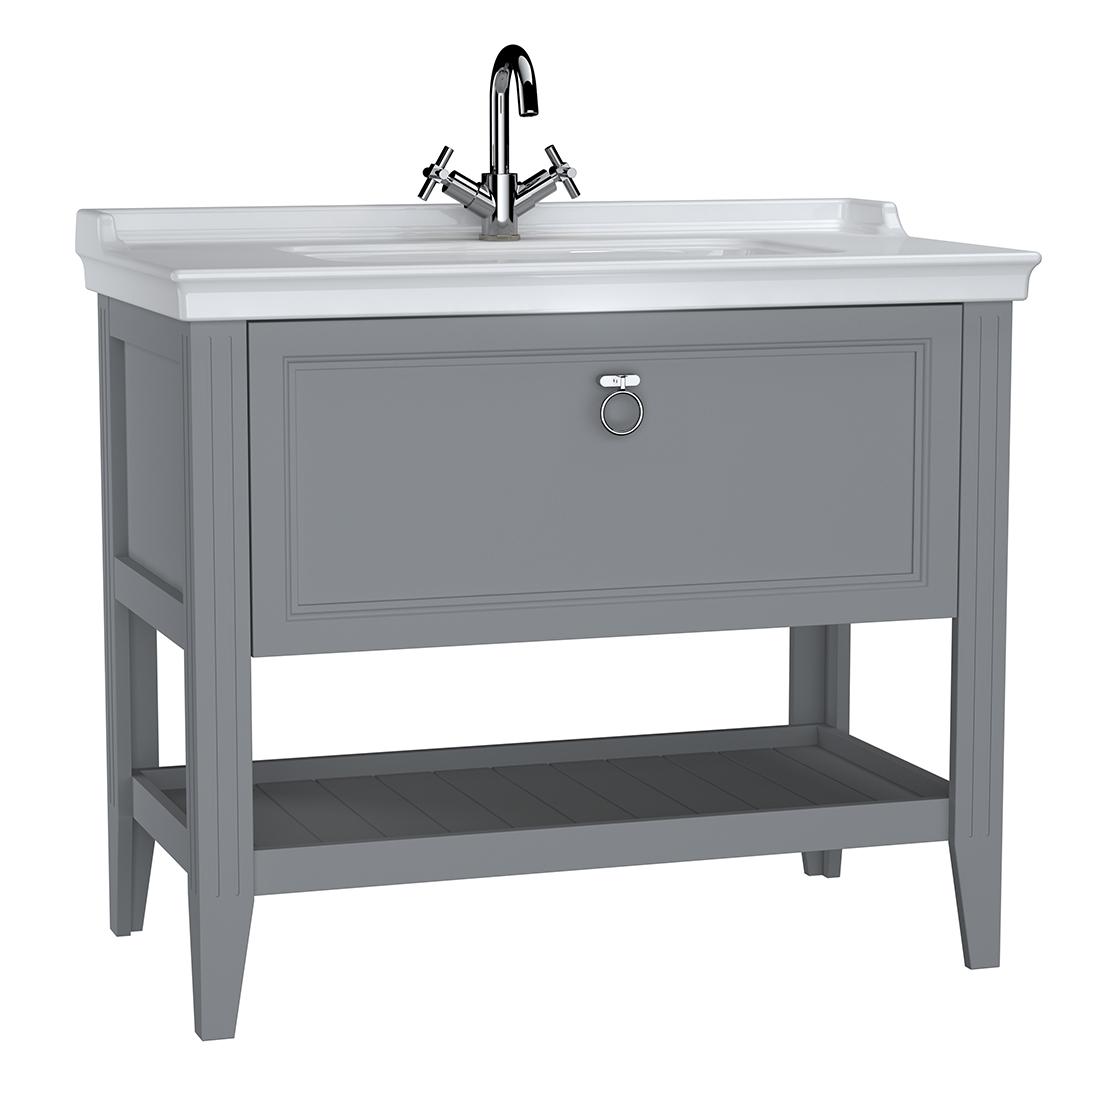 Valarte meuble avec plan céramique, 100 cm, avec tiror, gris mat